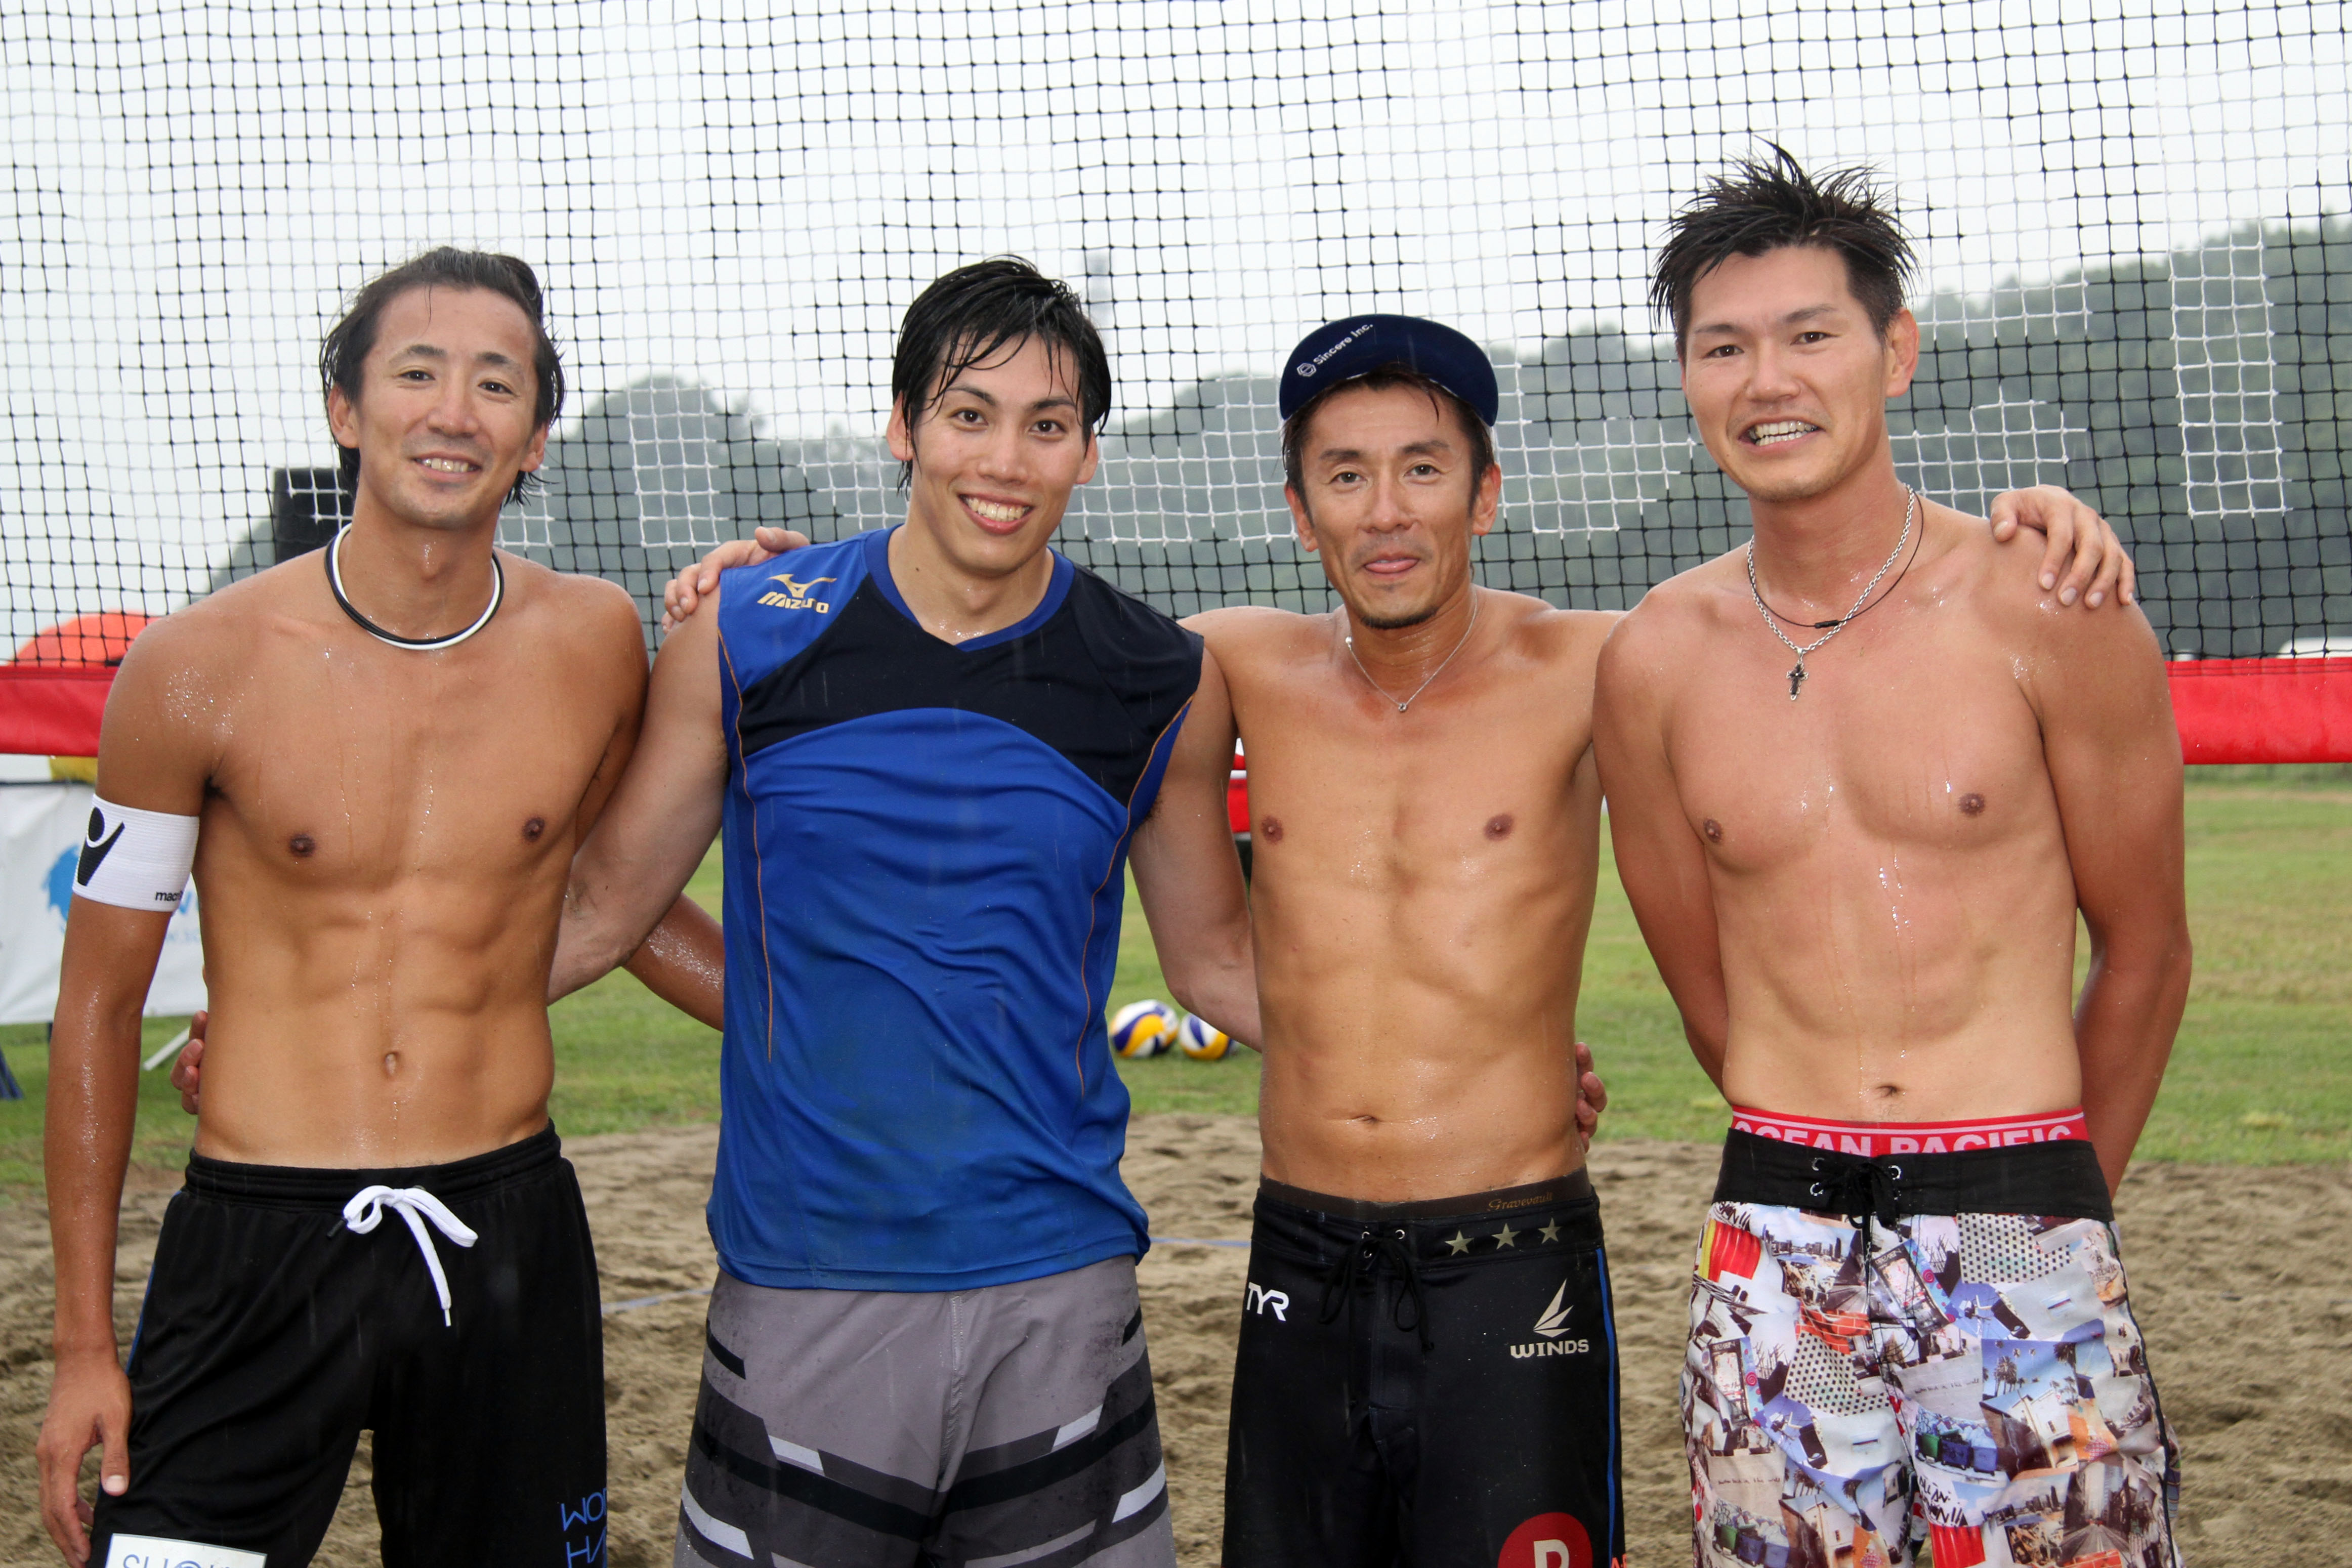 左から)上場選手、越川選手、西村選手、直弘選手